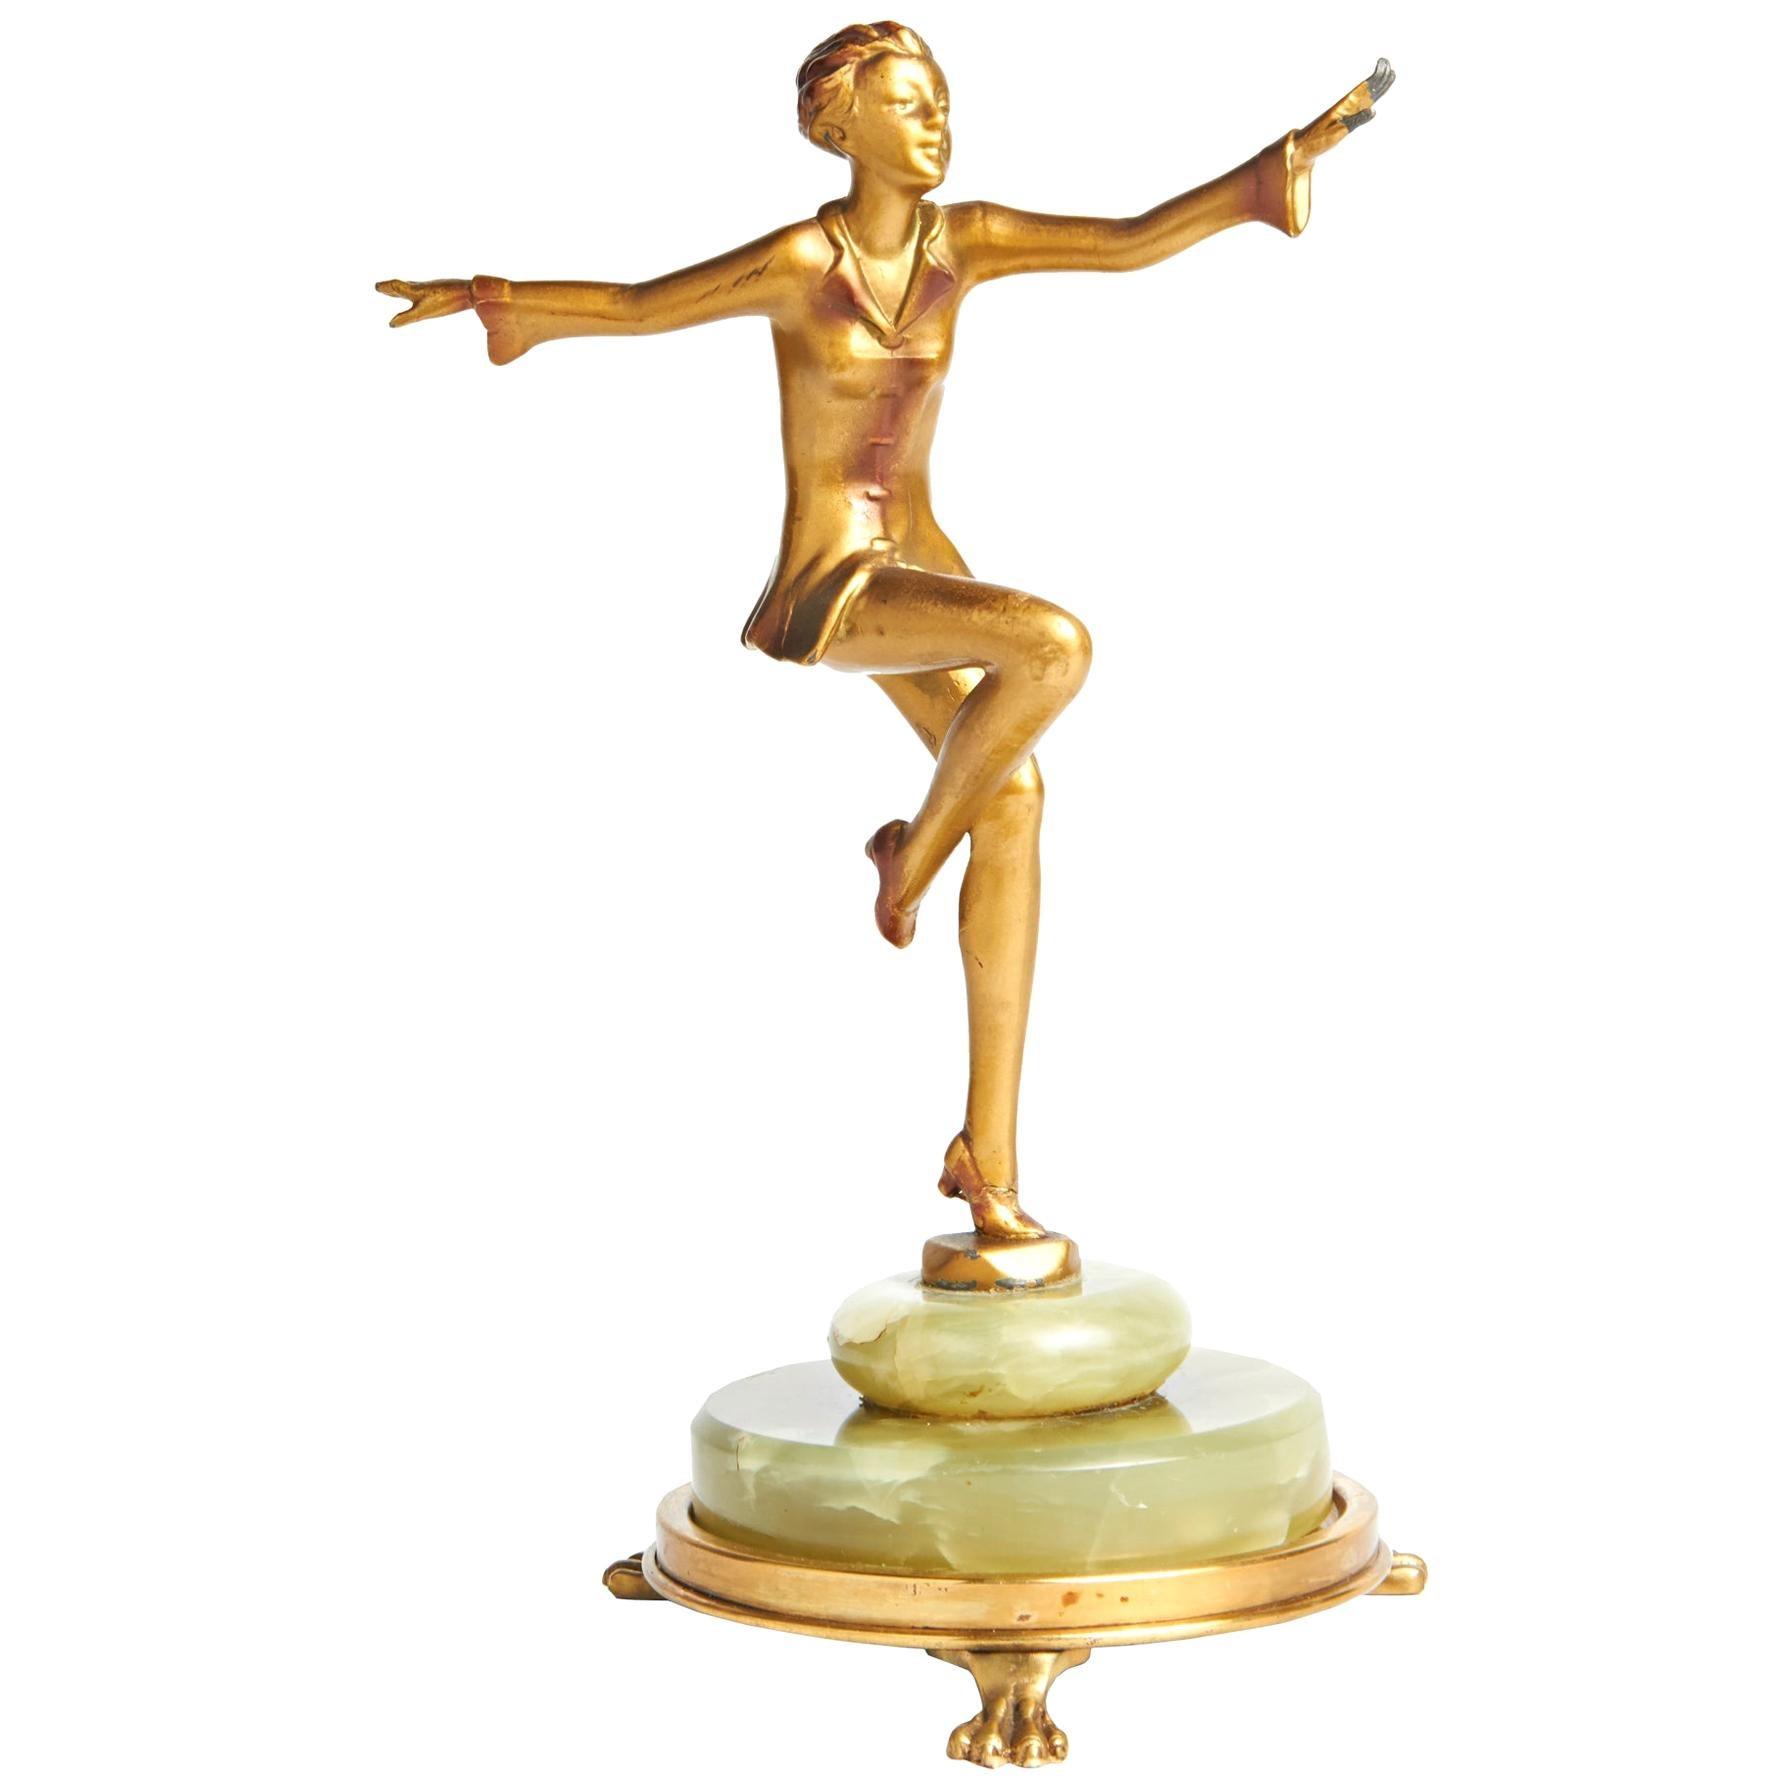 Austrian Art Deco Lorenzl Gilt Bronze Dancing Figure on Green Onyx Base